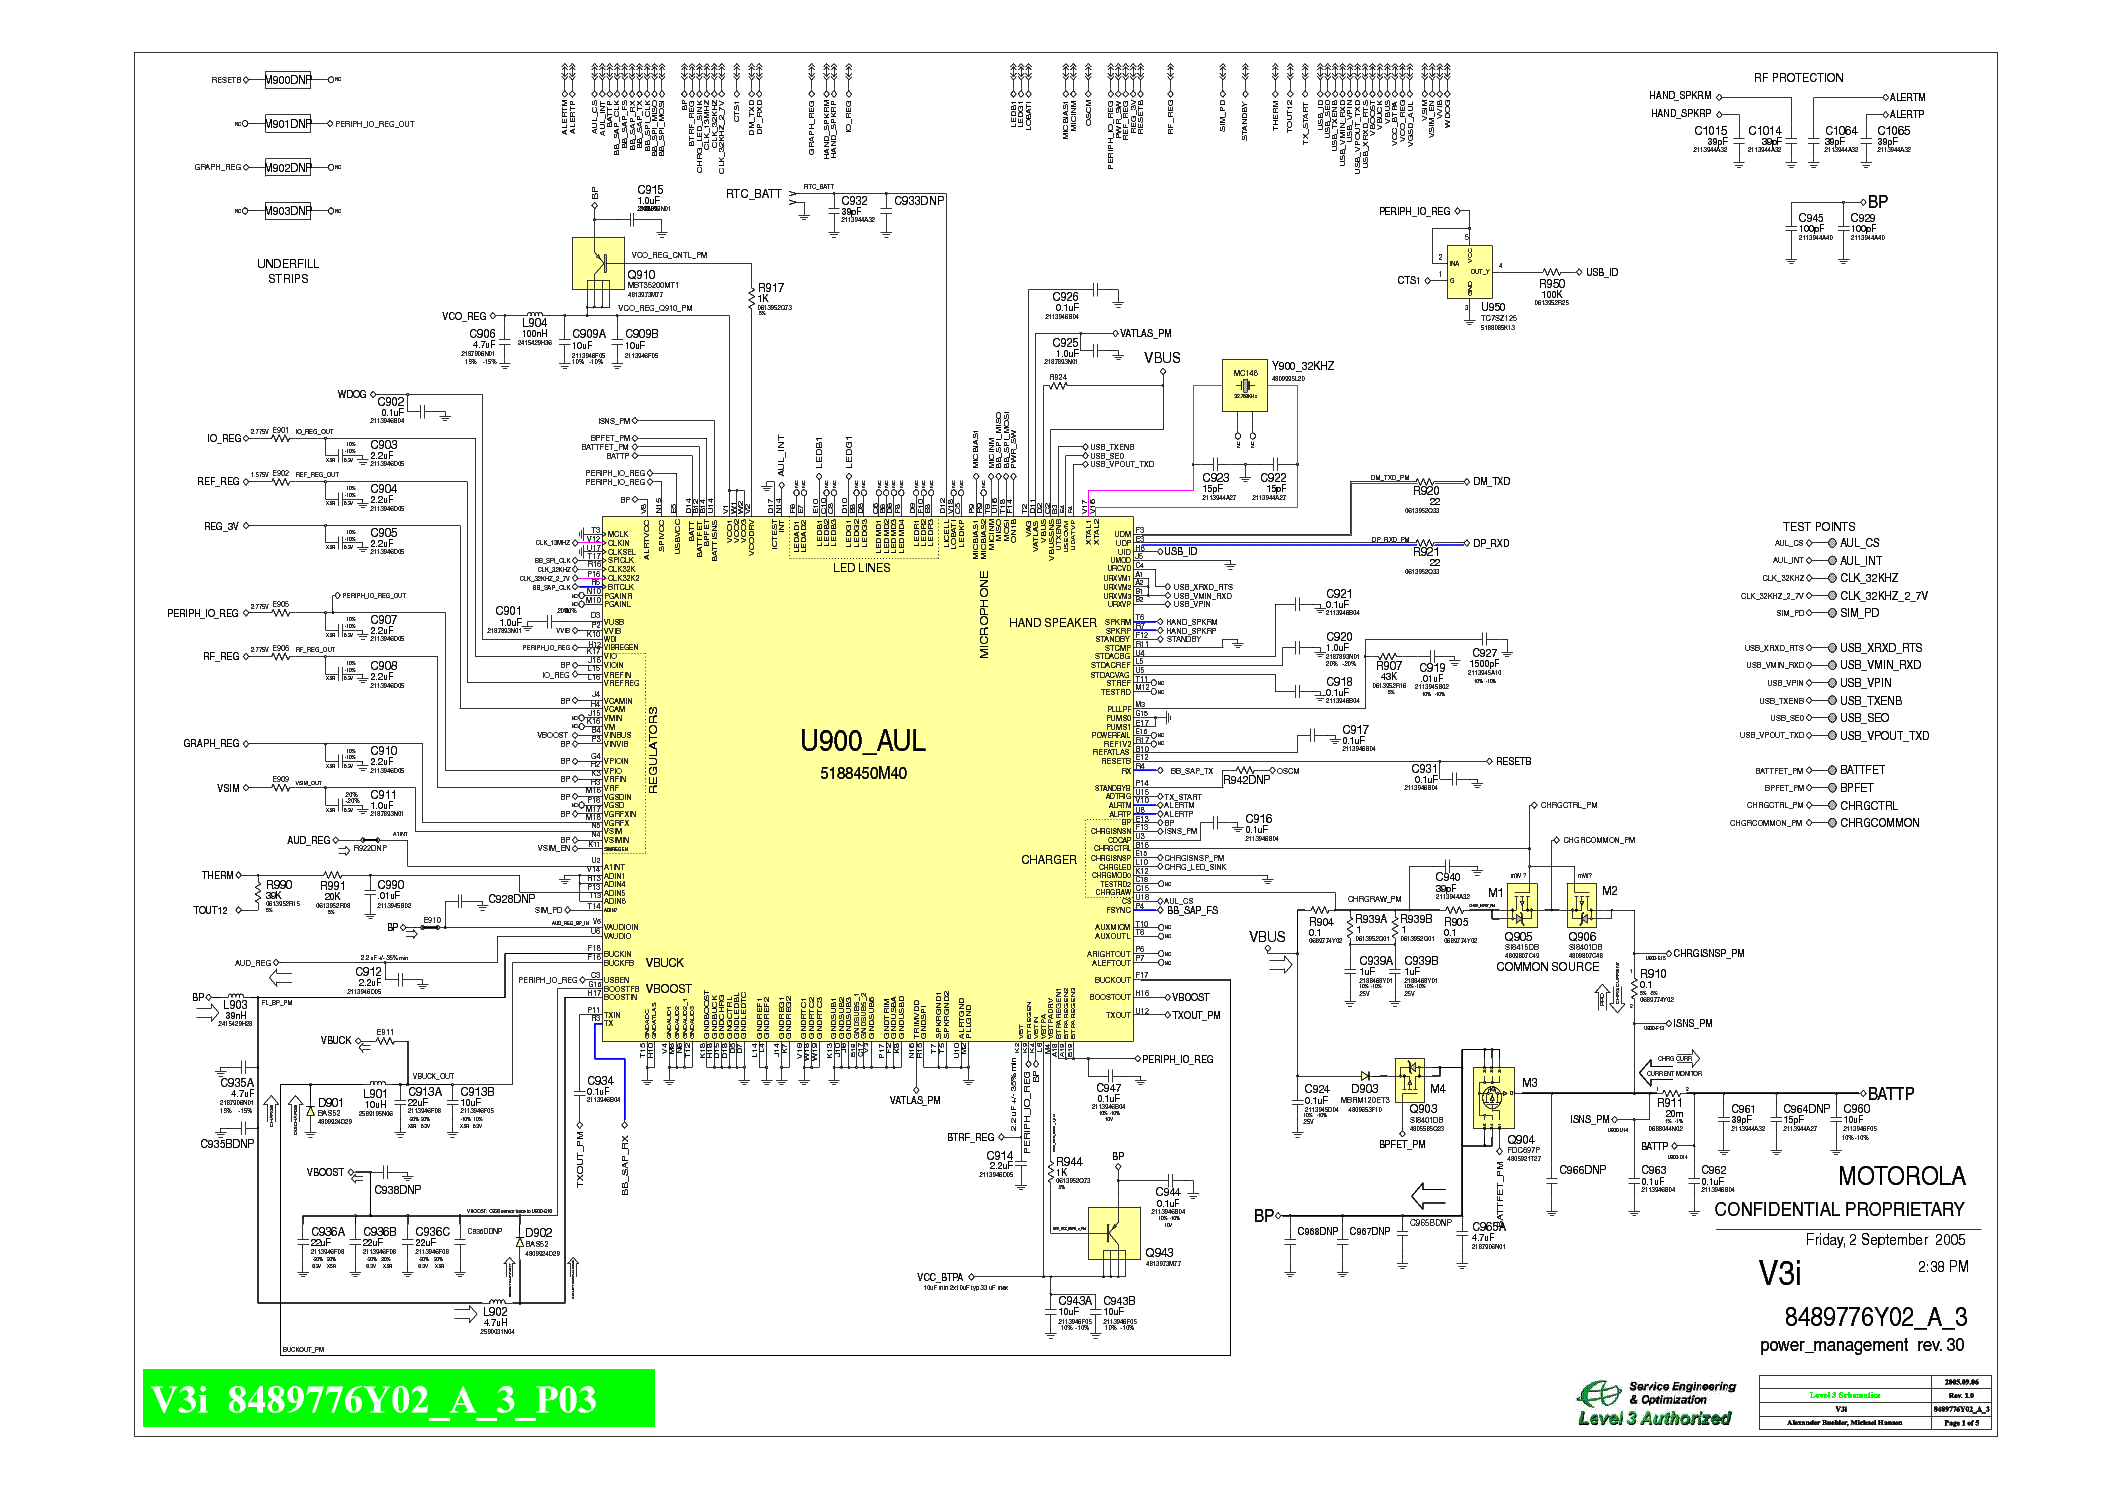 motorola v3i sch service manual download schematics eeprom repair rh elektrotanya com Spectra V3i Whites V3i